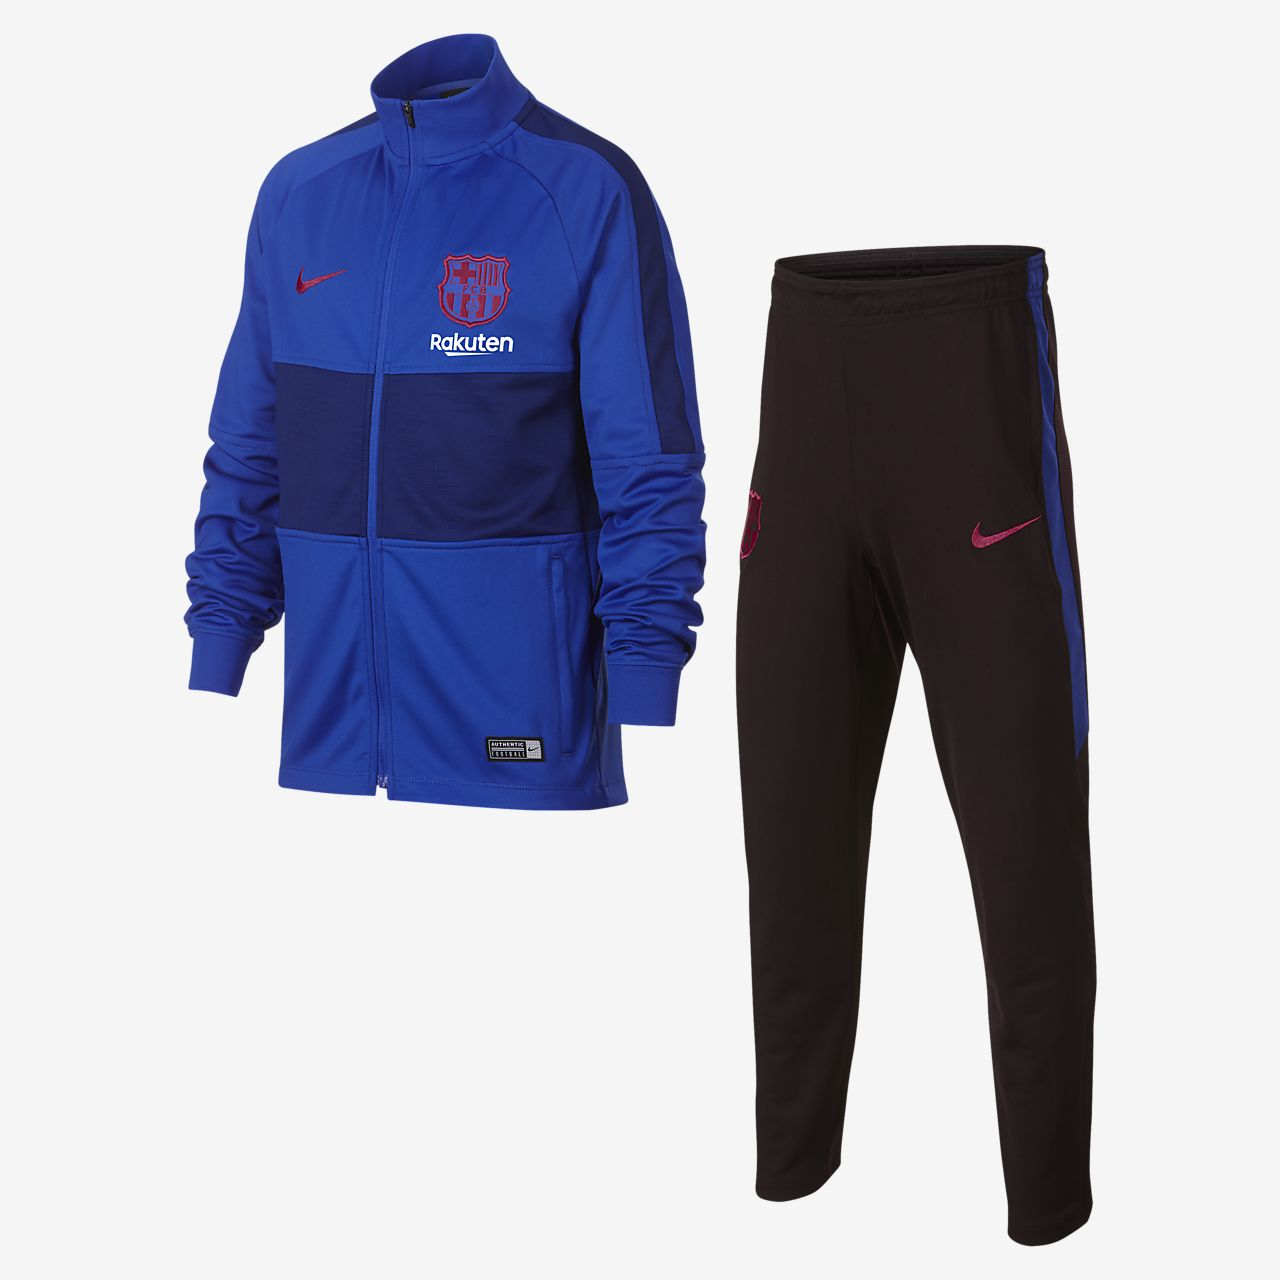 Nike Dri-FIT FC Barcelona Strike Xandall de futbol - Nen/a